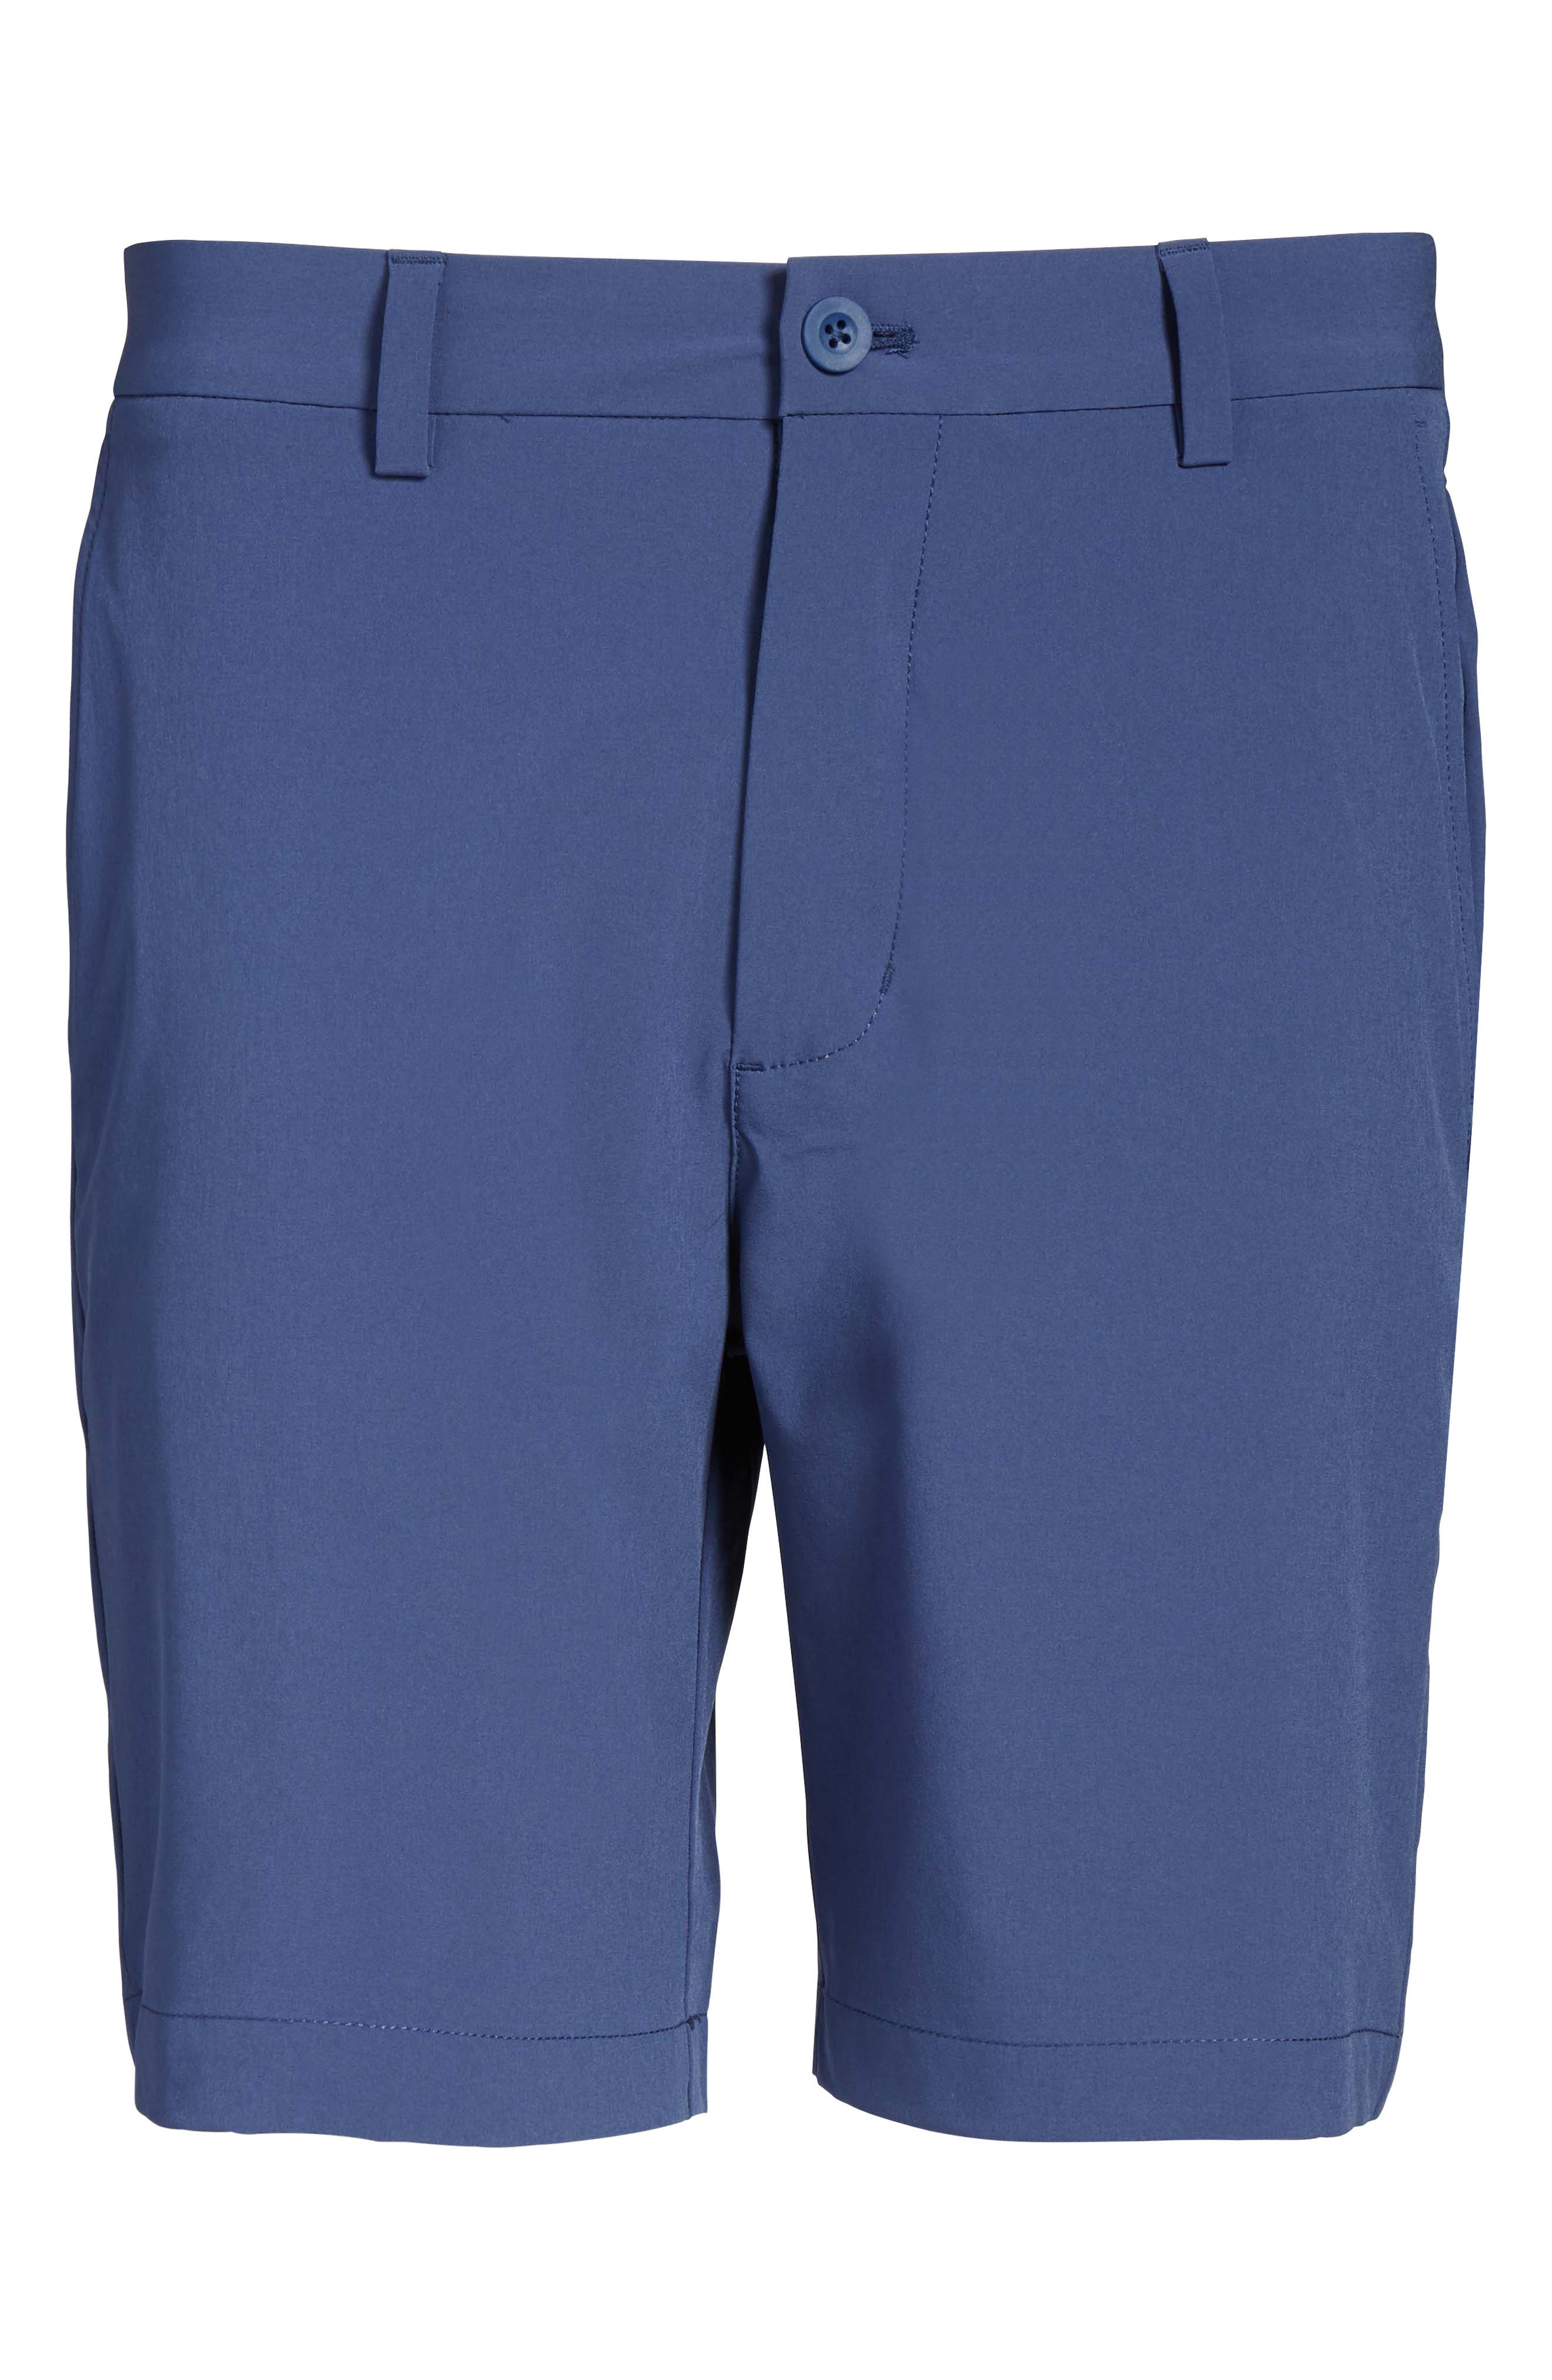 8 Inch Performance Breaker Shorts,                             Alternate thumbnail 78, color,